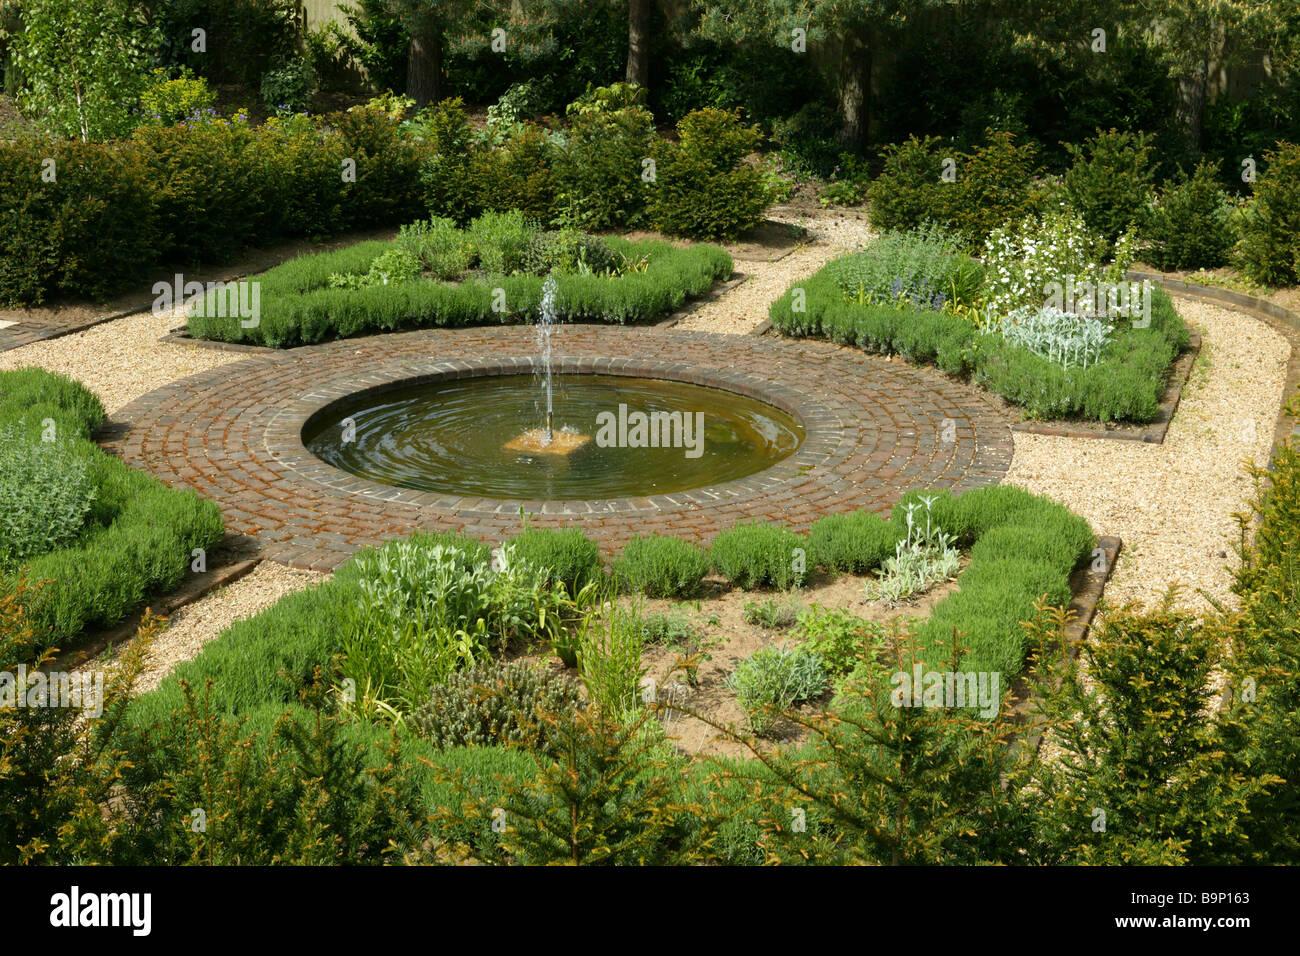 amnager un jardin anglais am nager un petit jardin for amenager un jardin anglais with amnager. Black Bedroom Furniture Sets. Home Design Ideas